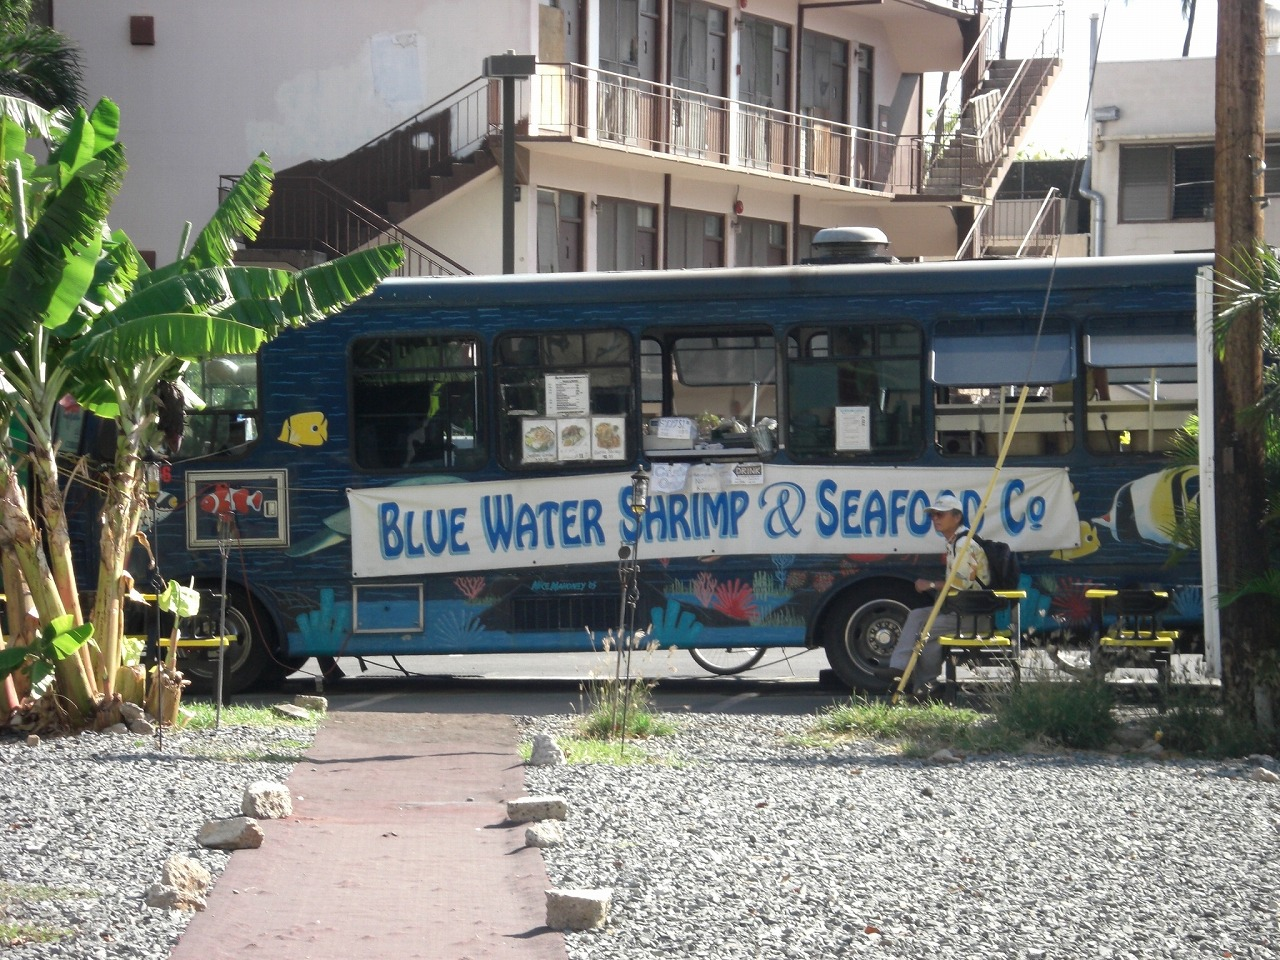 Blue_water_shrimp_seafood_co2008